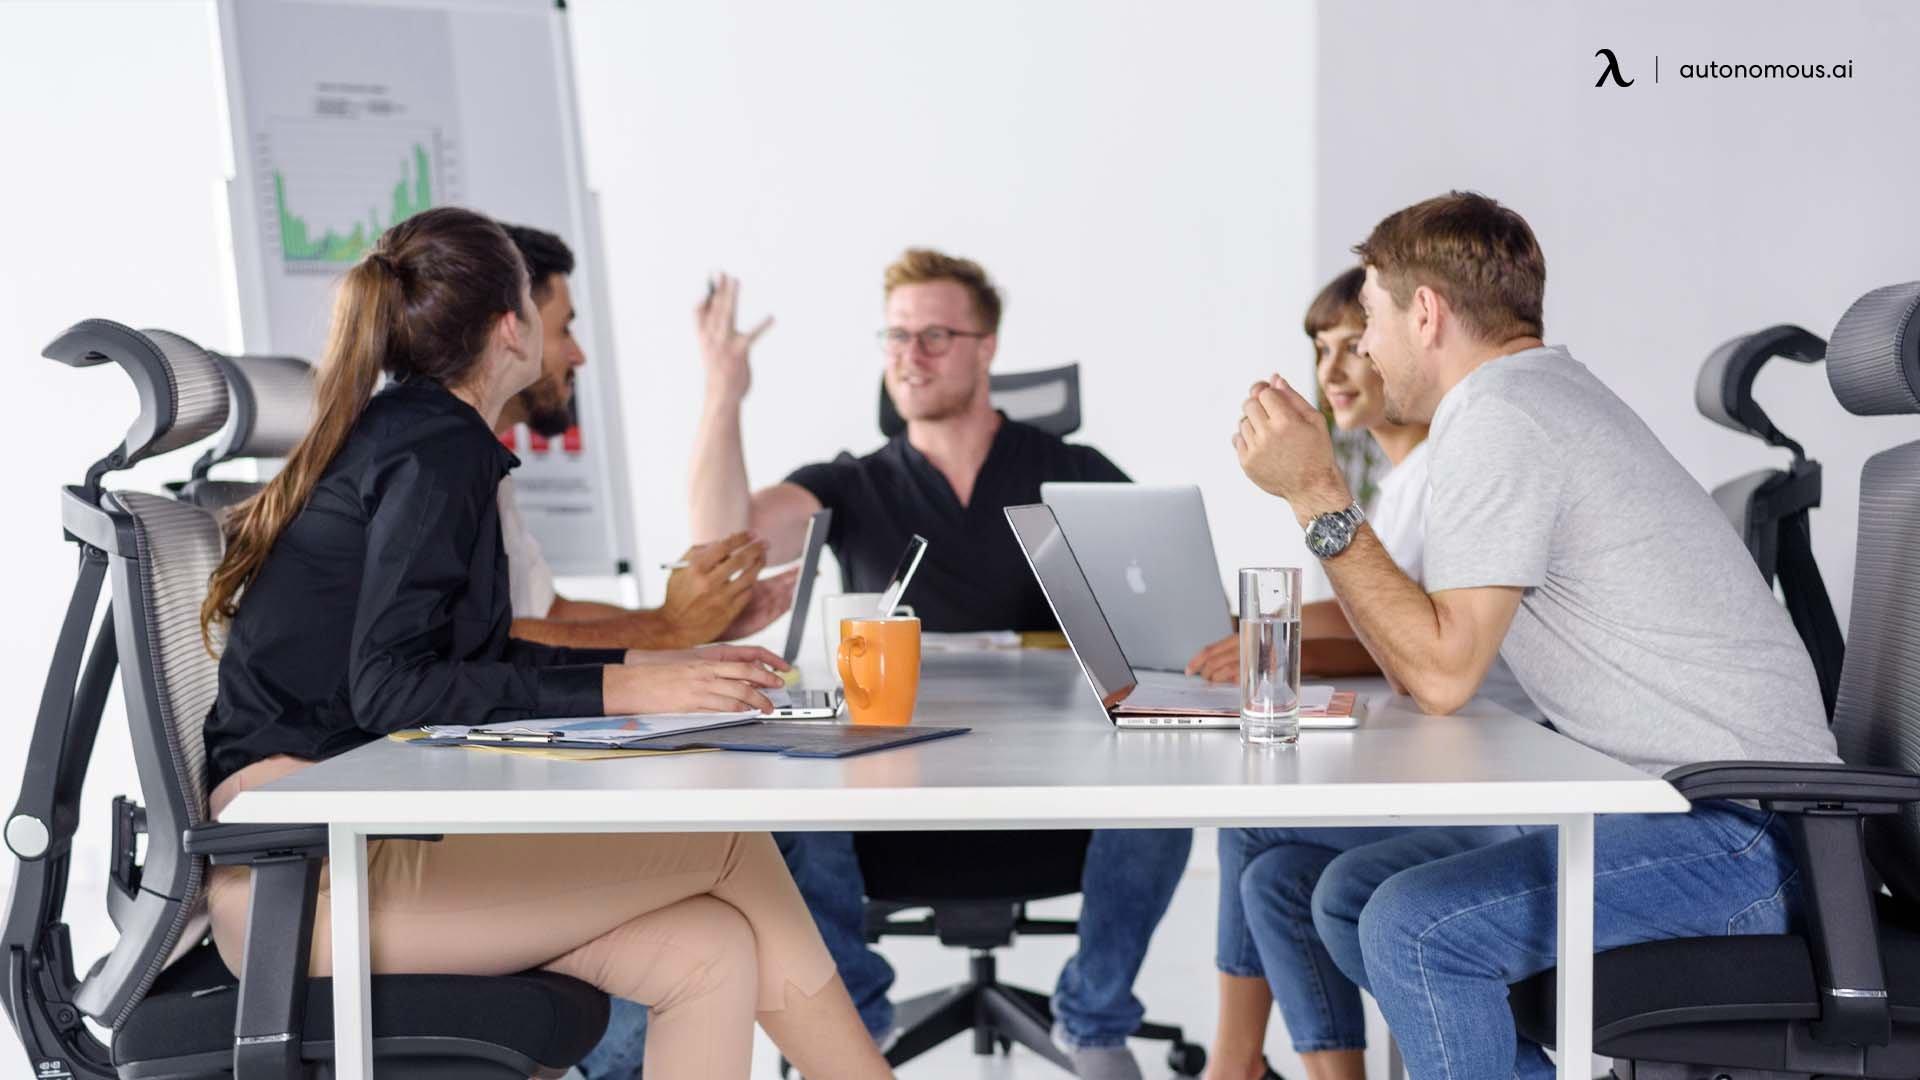 Workshop or working groups